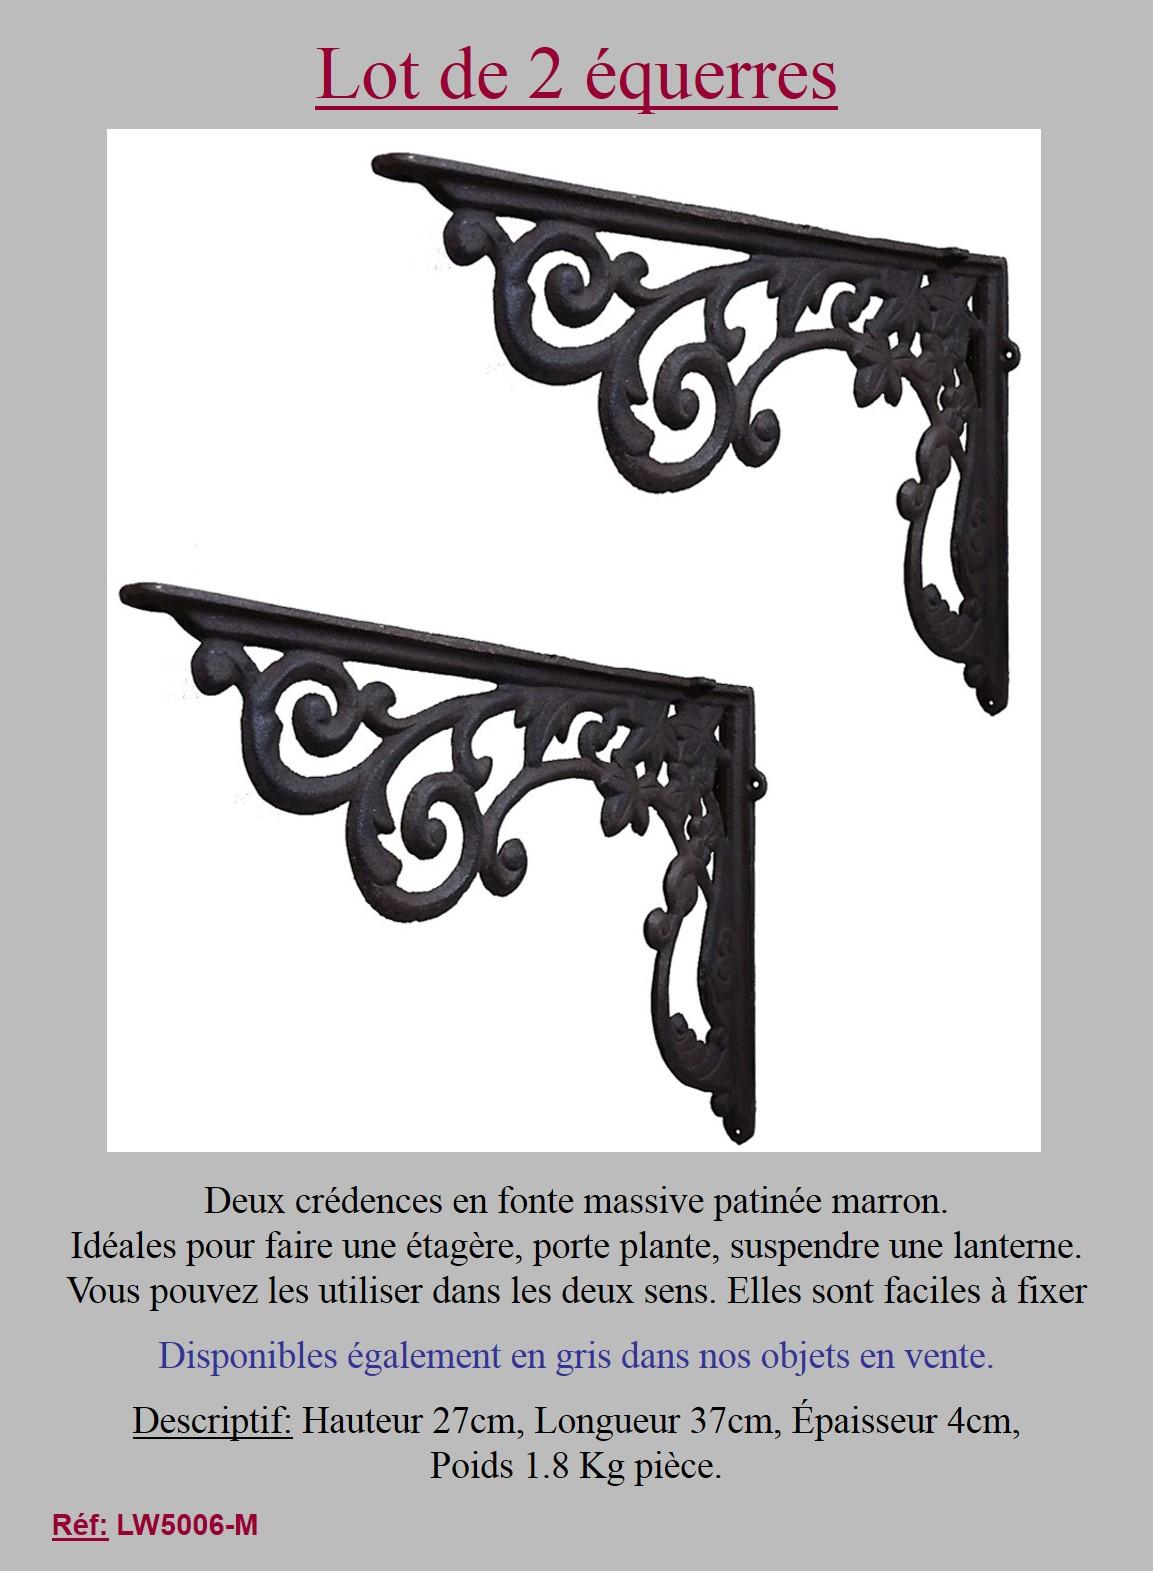 2 grande equerre marron credence angle etagere murale potence fonte 27x37cm ebay. Black Bedroom Furniture Sets. Home Design Ideas